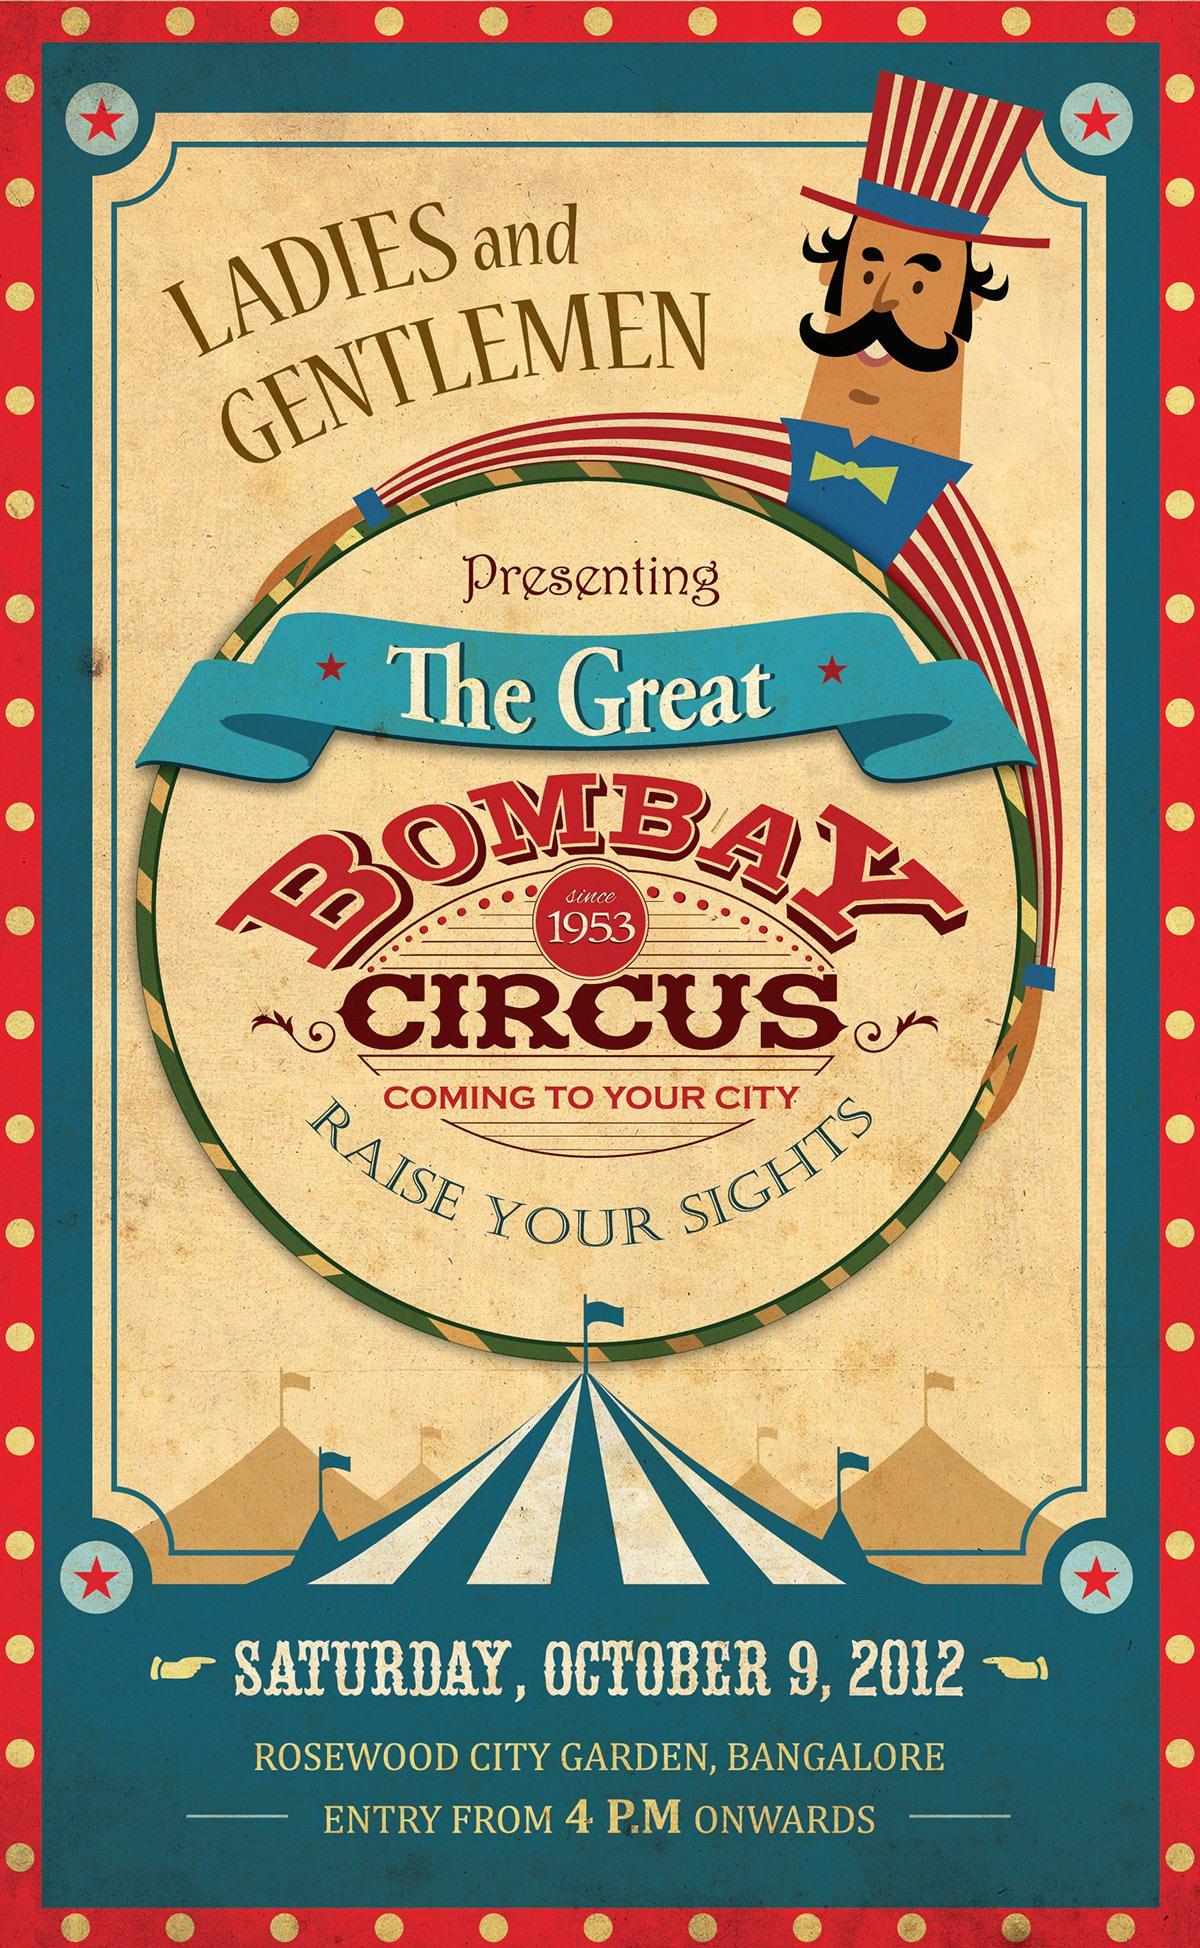 12. Bombay Circus